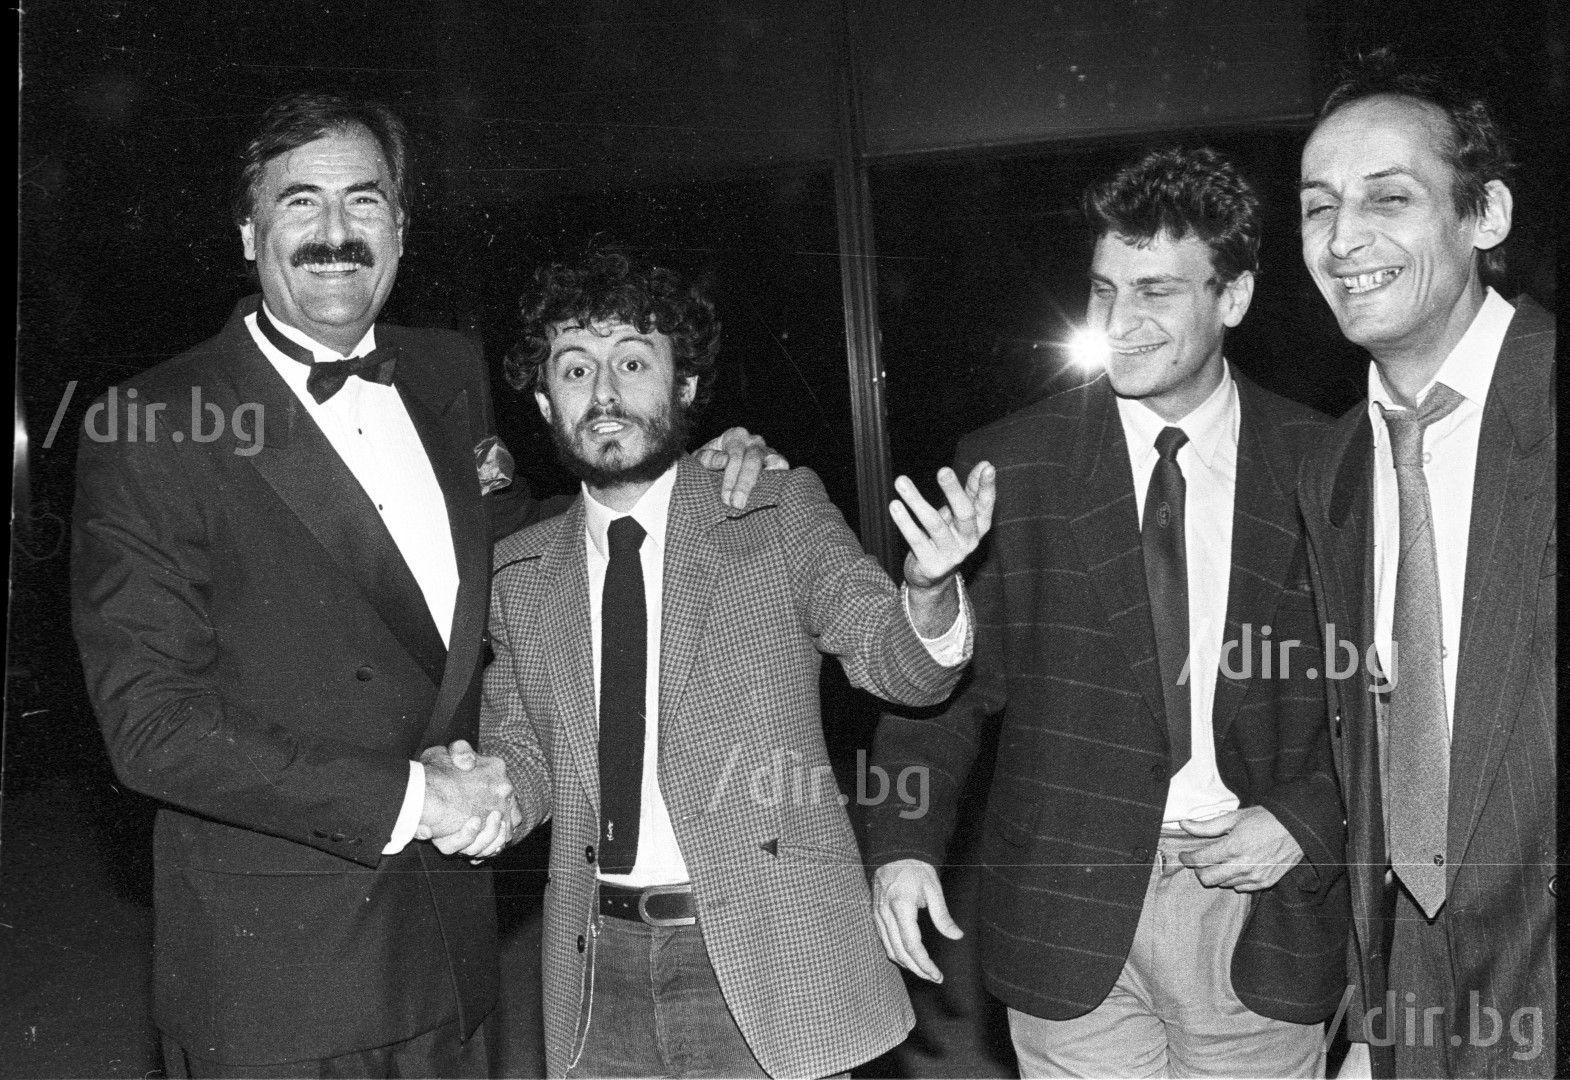 Жорж Ганчев до Соломон Паси, Петър Корумбашев и Зафер Галибов през 1991 г.